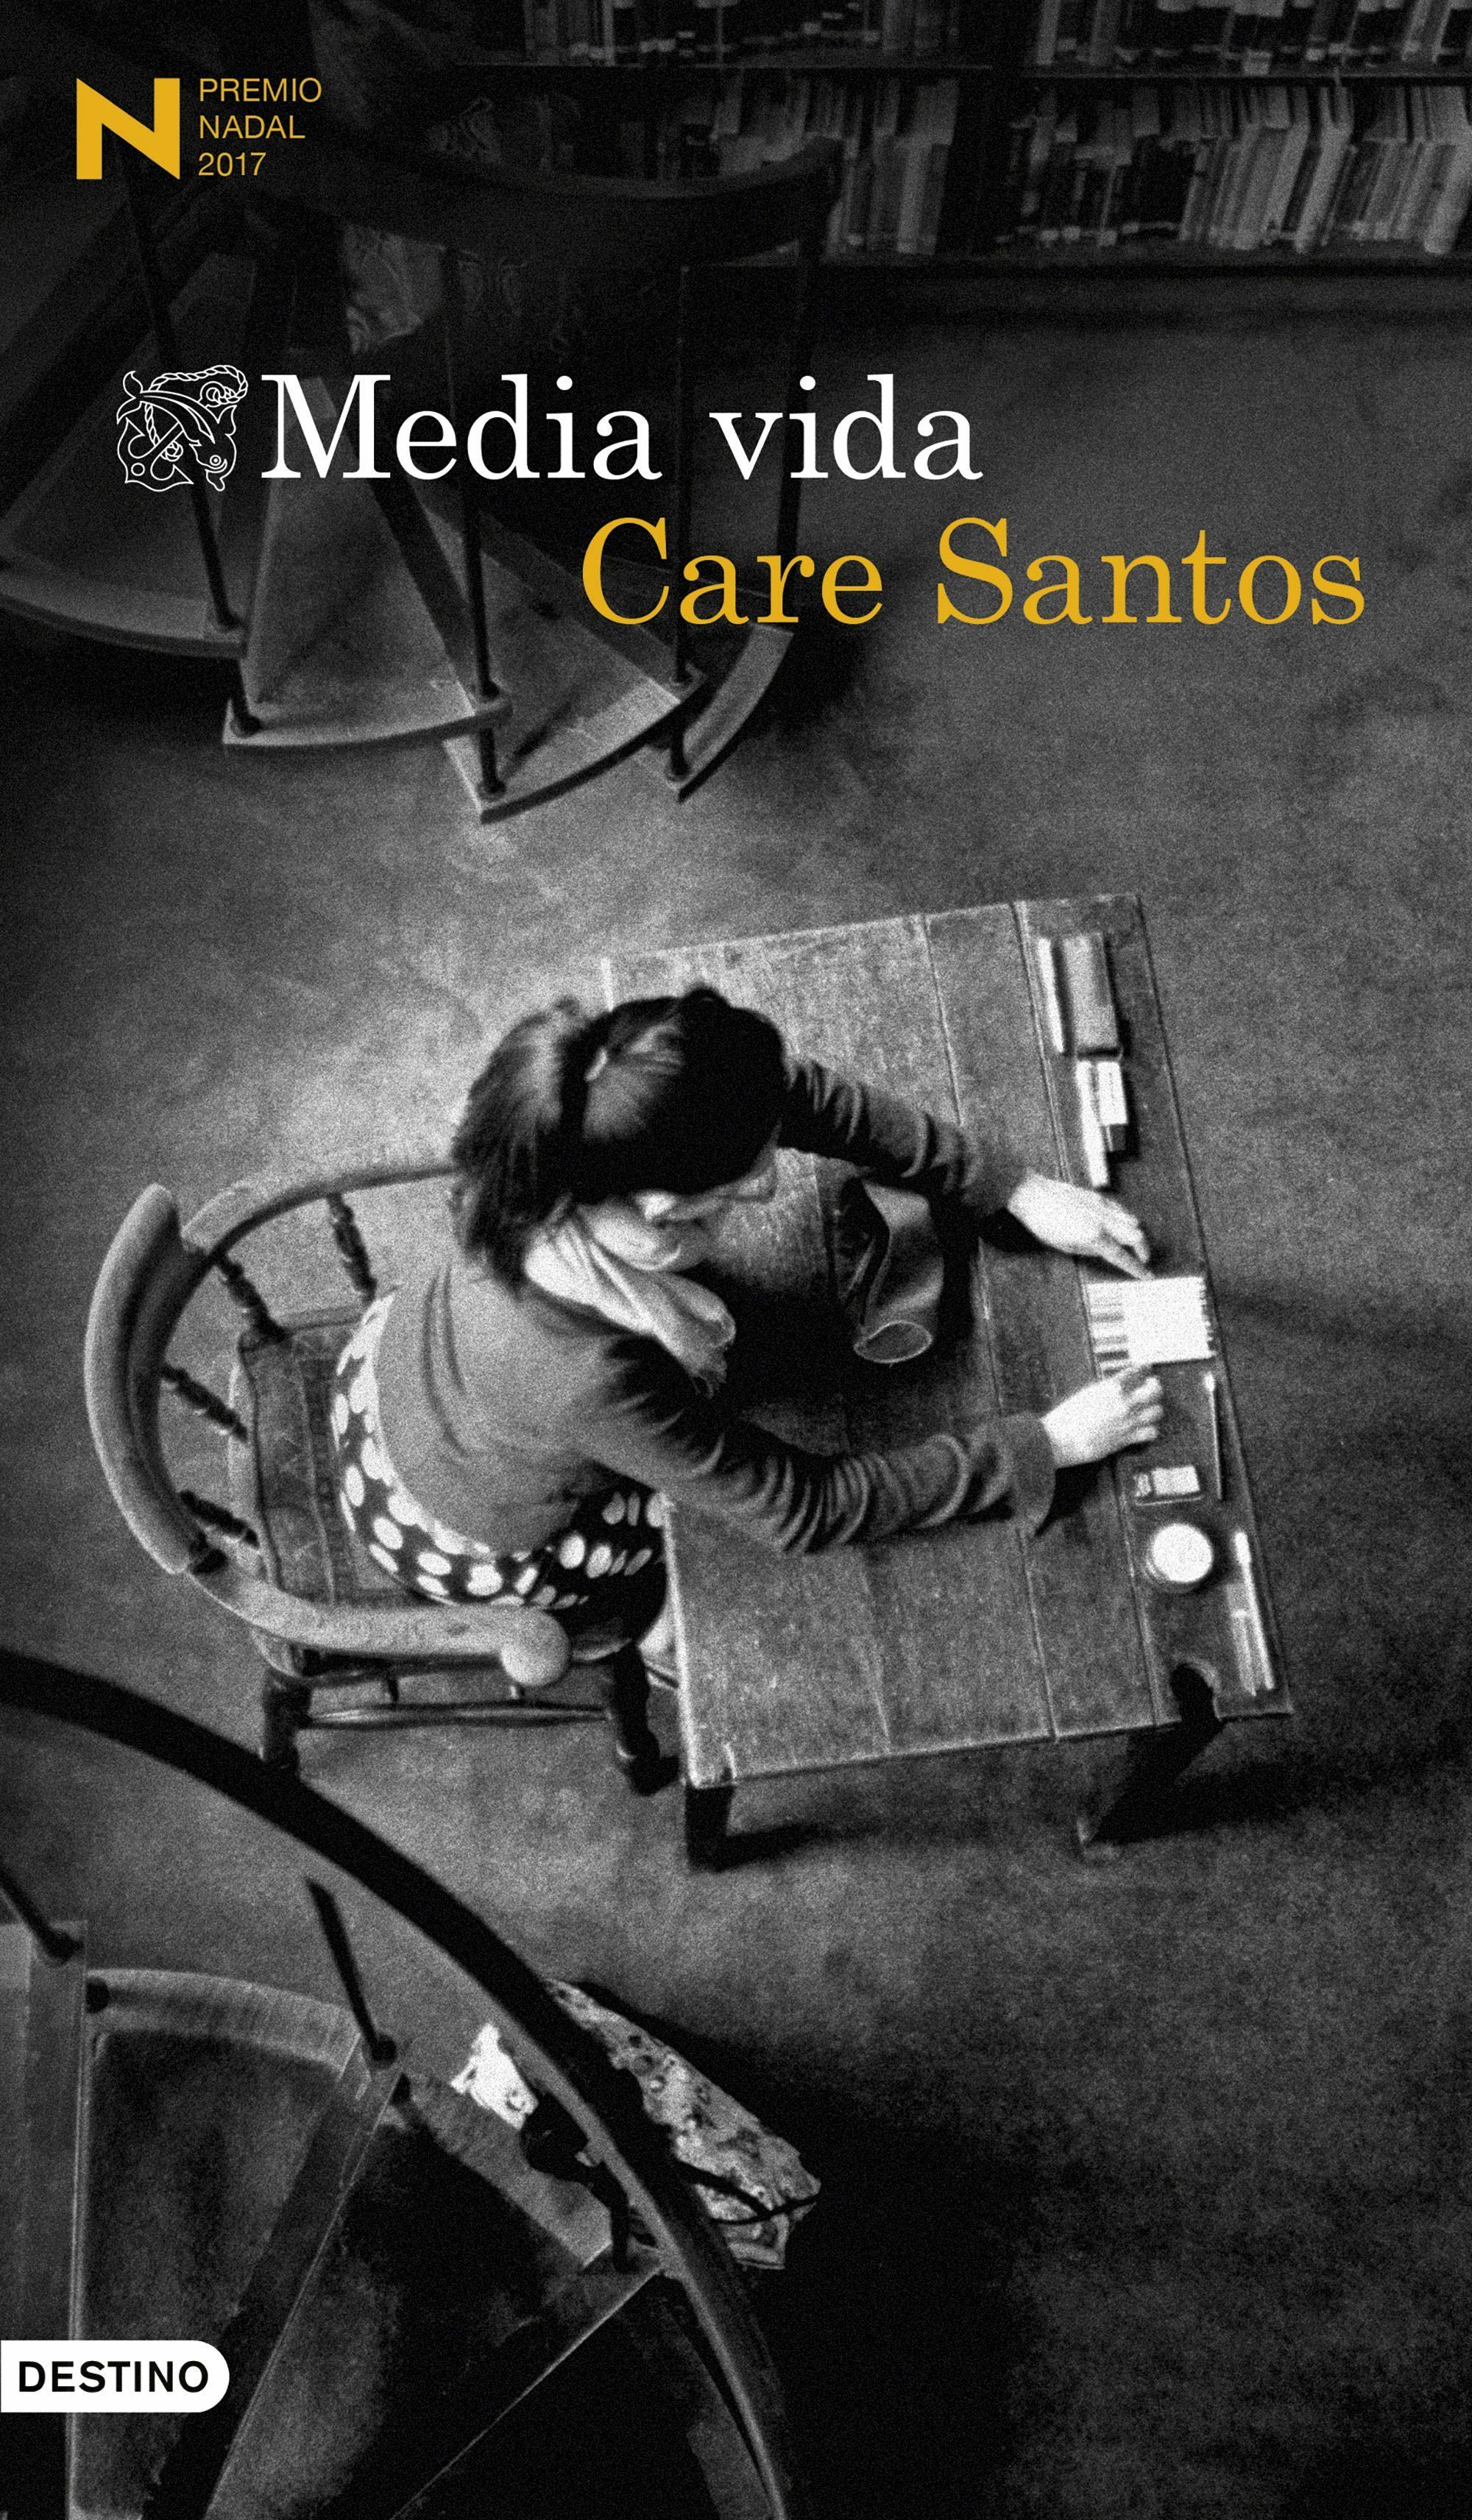 Media vida - Care Santos 9788423351831